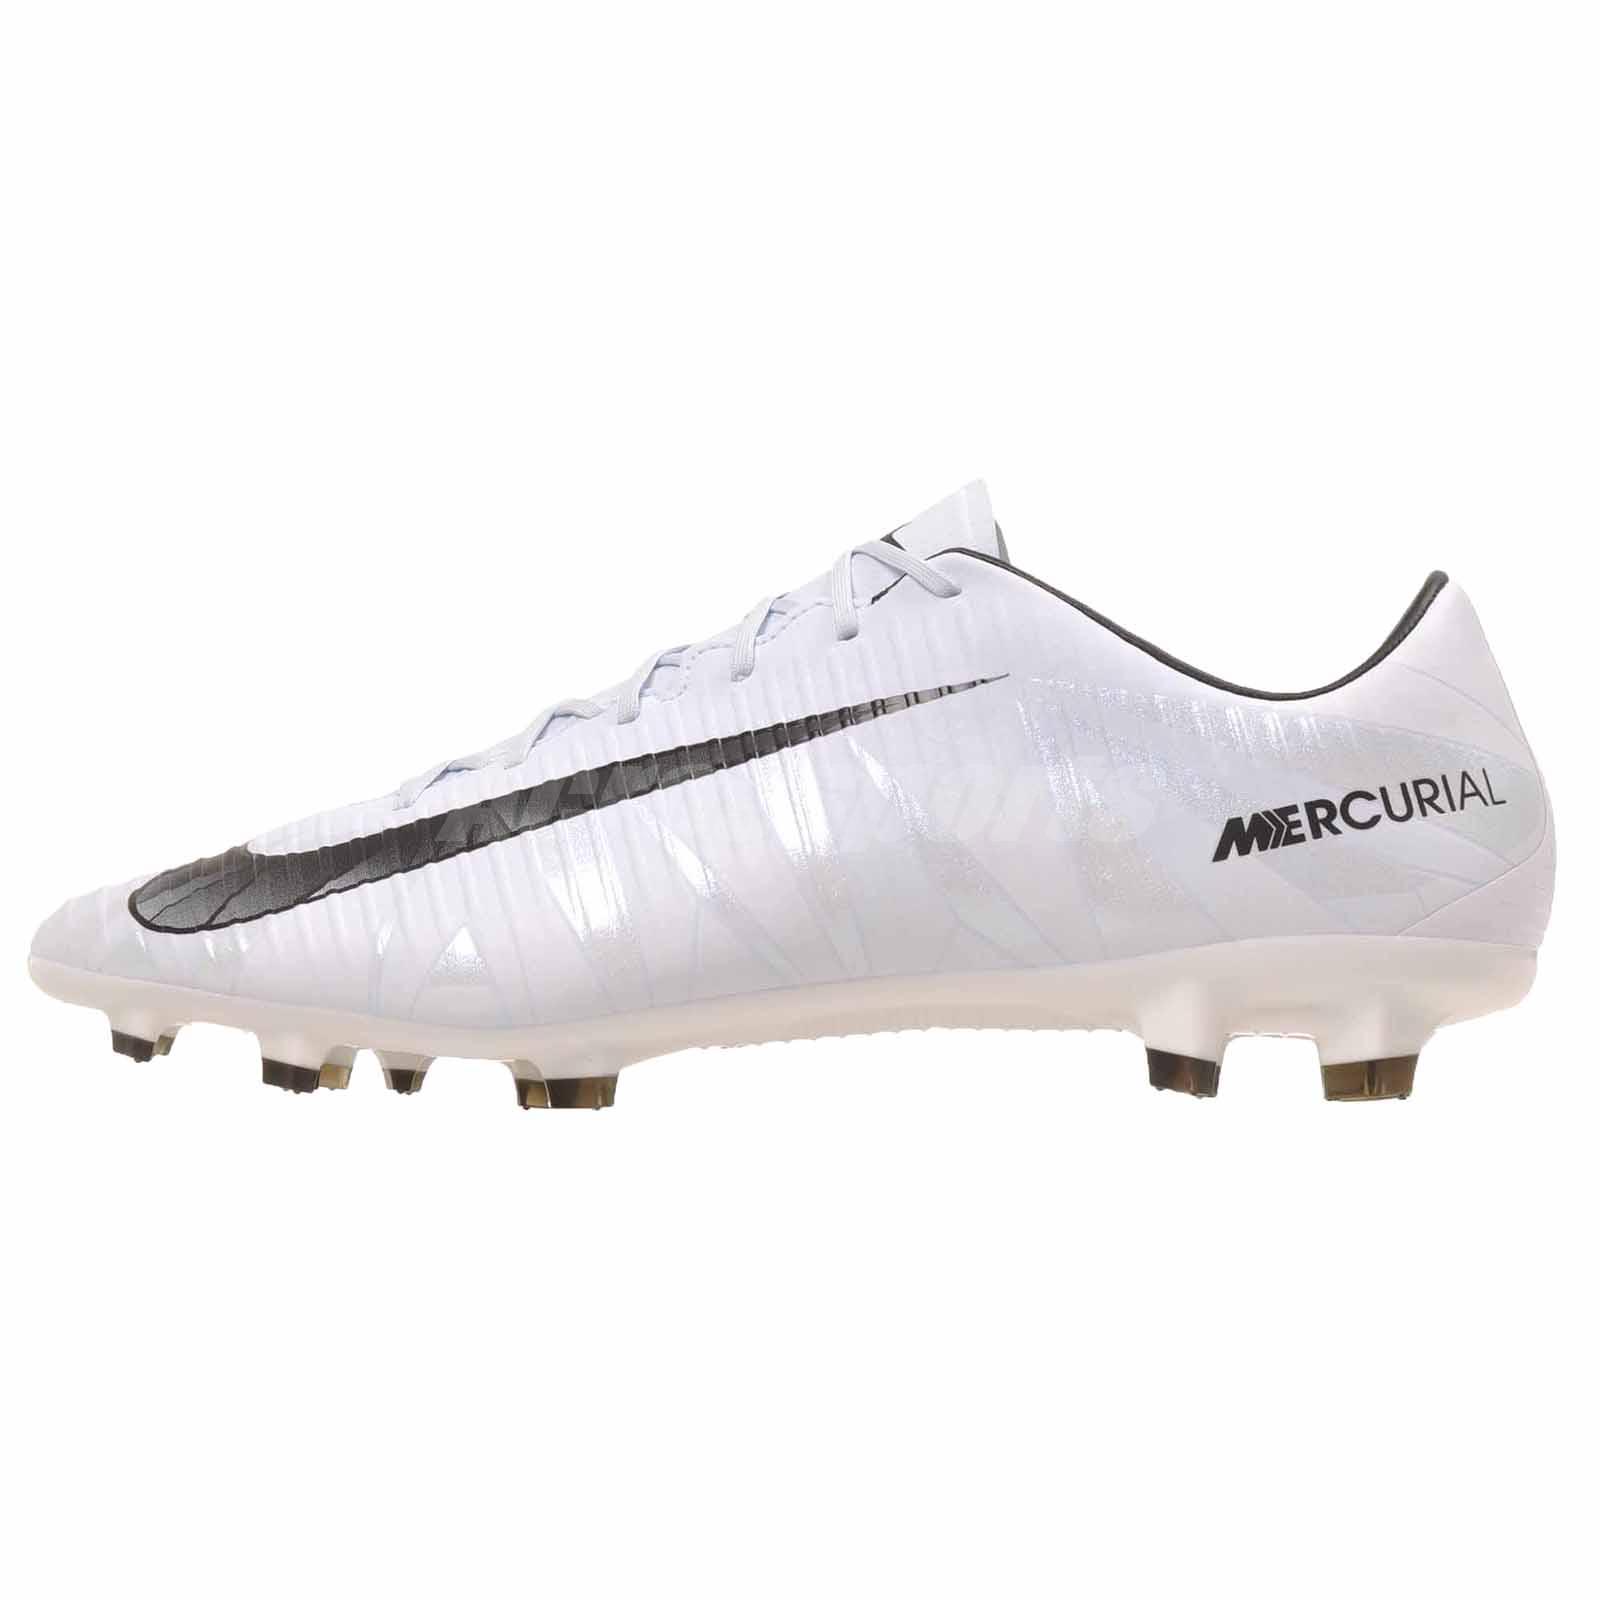 f04463e13 ... greece nike mercurial veloce iii cr7 fg soccer mens ronaldo shoes blue  tint 858736 401 3d978